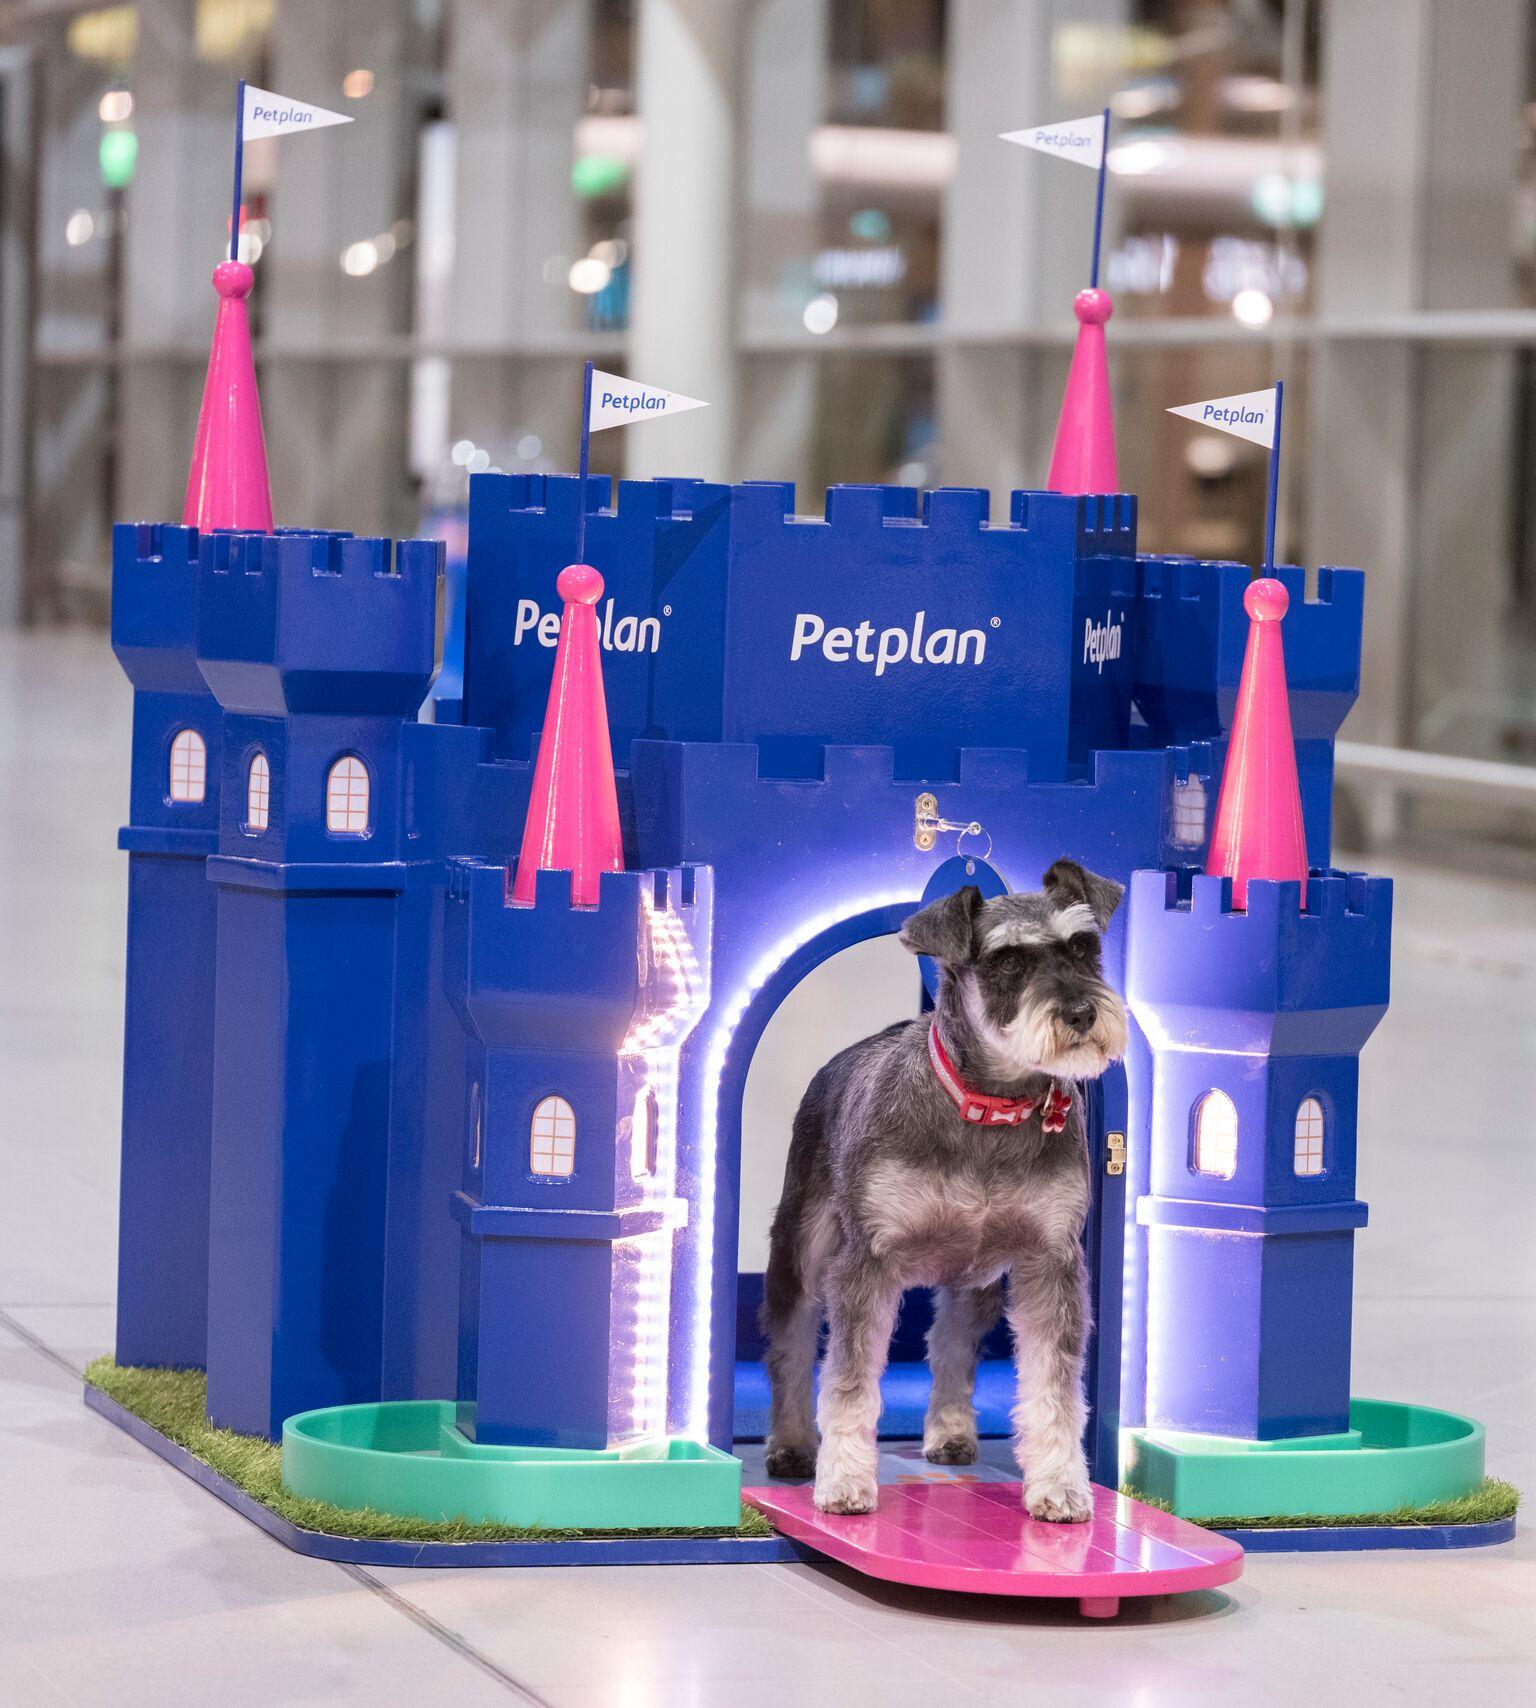 Petplan - Laura D'Alessandro of Henson Franklin - Barkingham Palace - Image 4 of 6